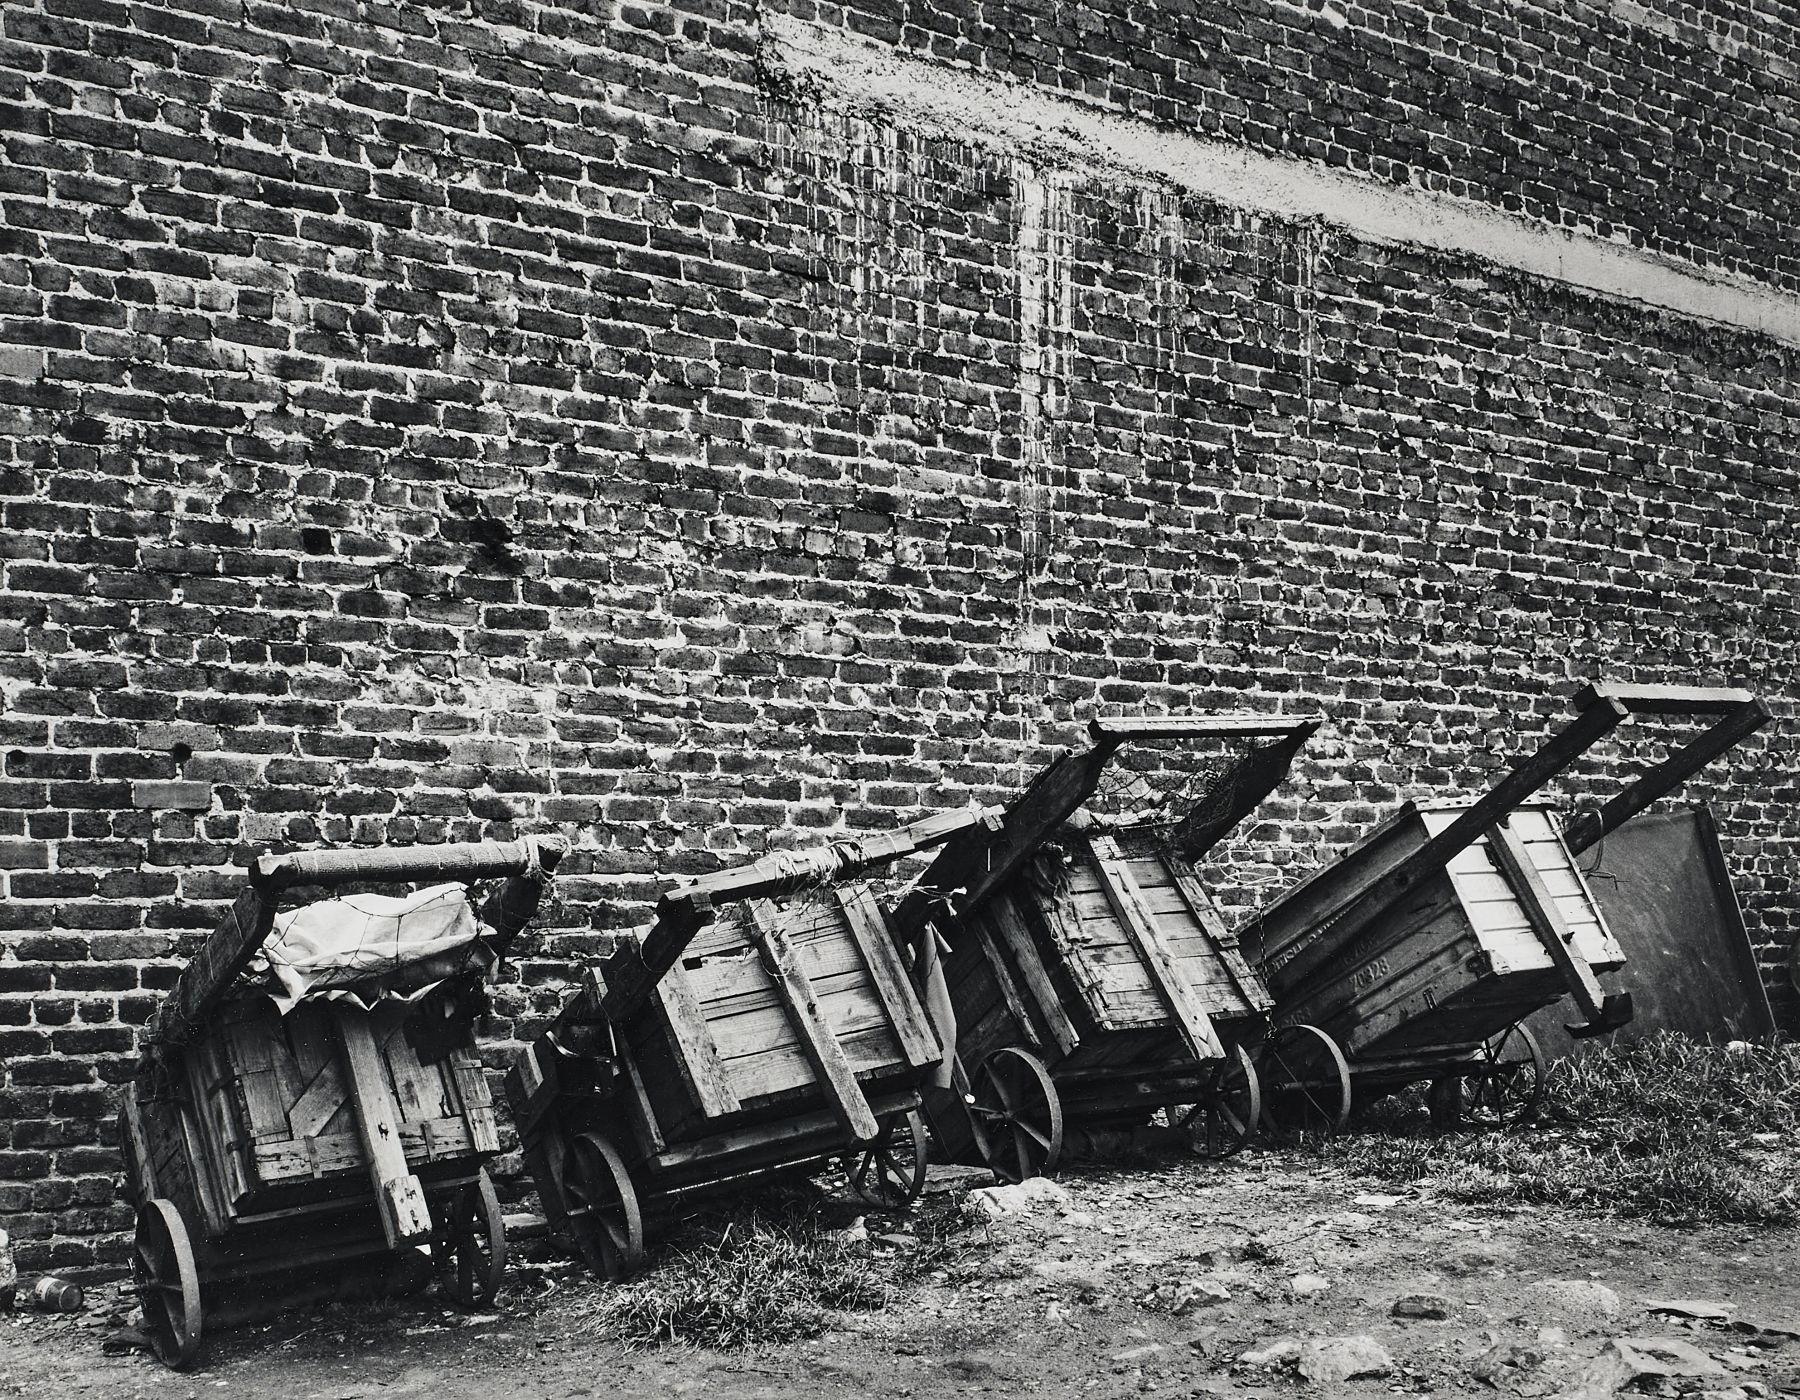 David Goldblatt the carts